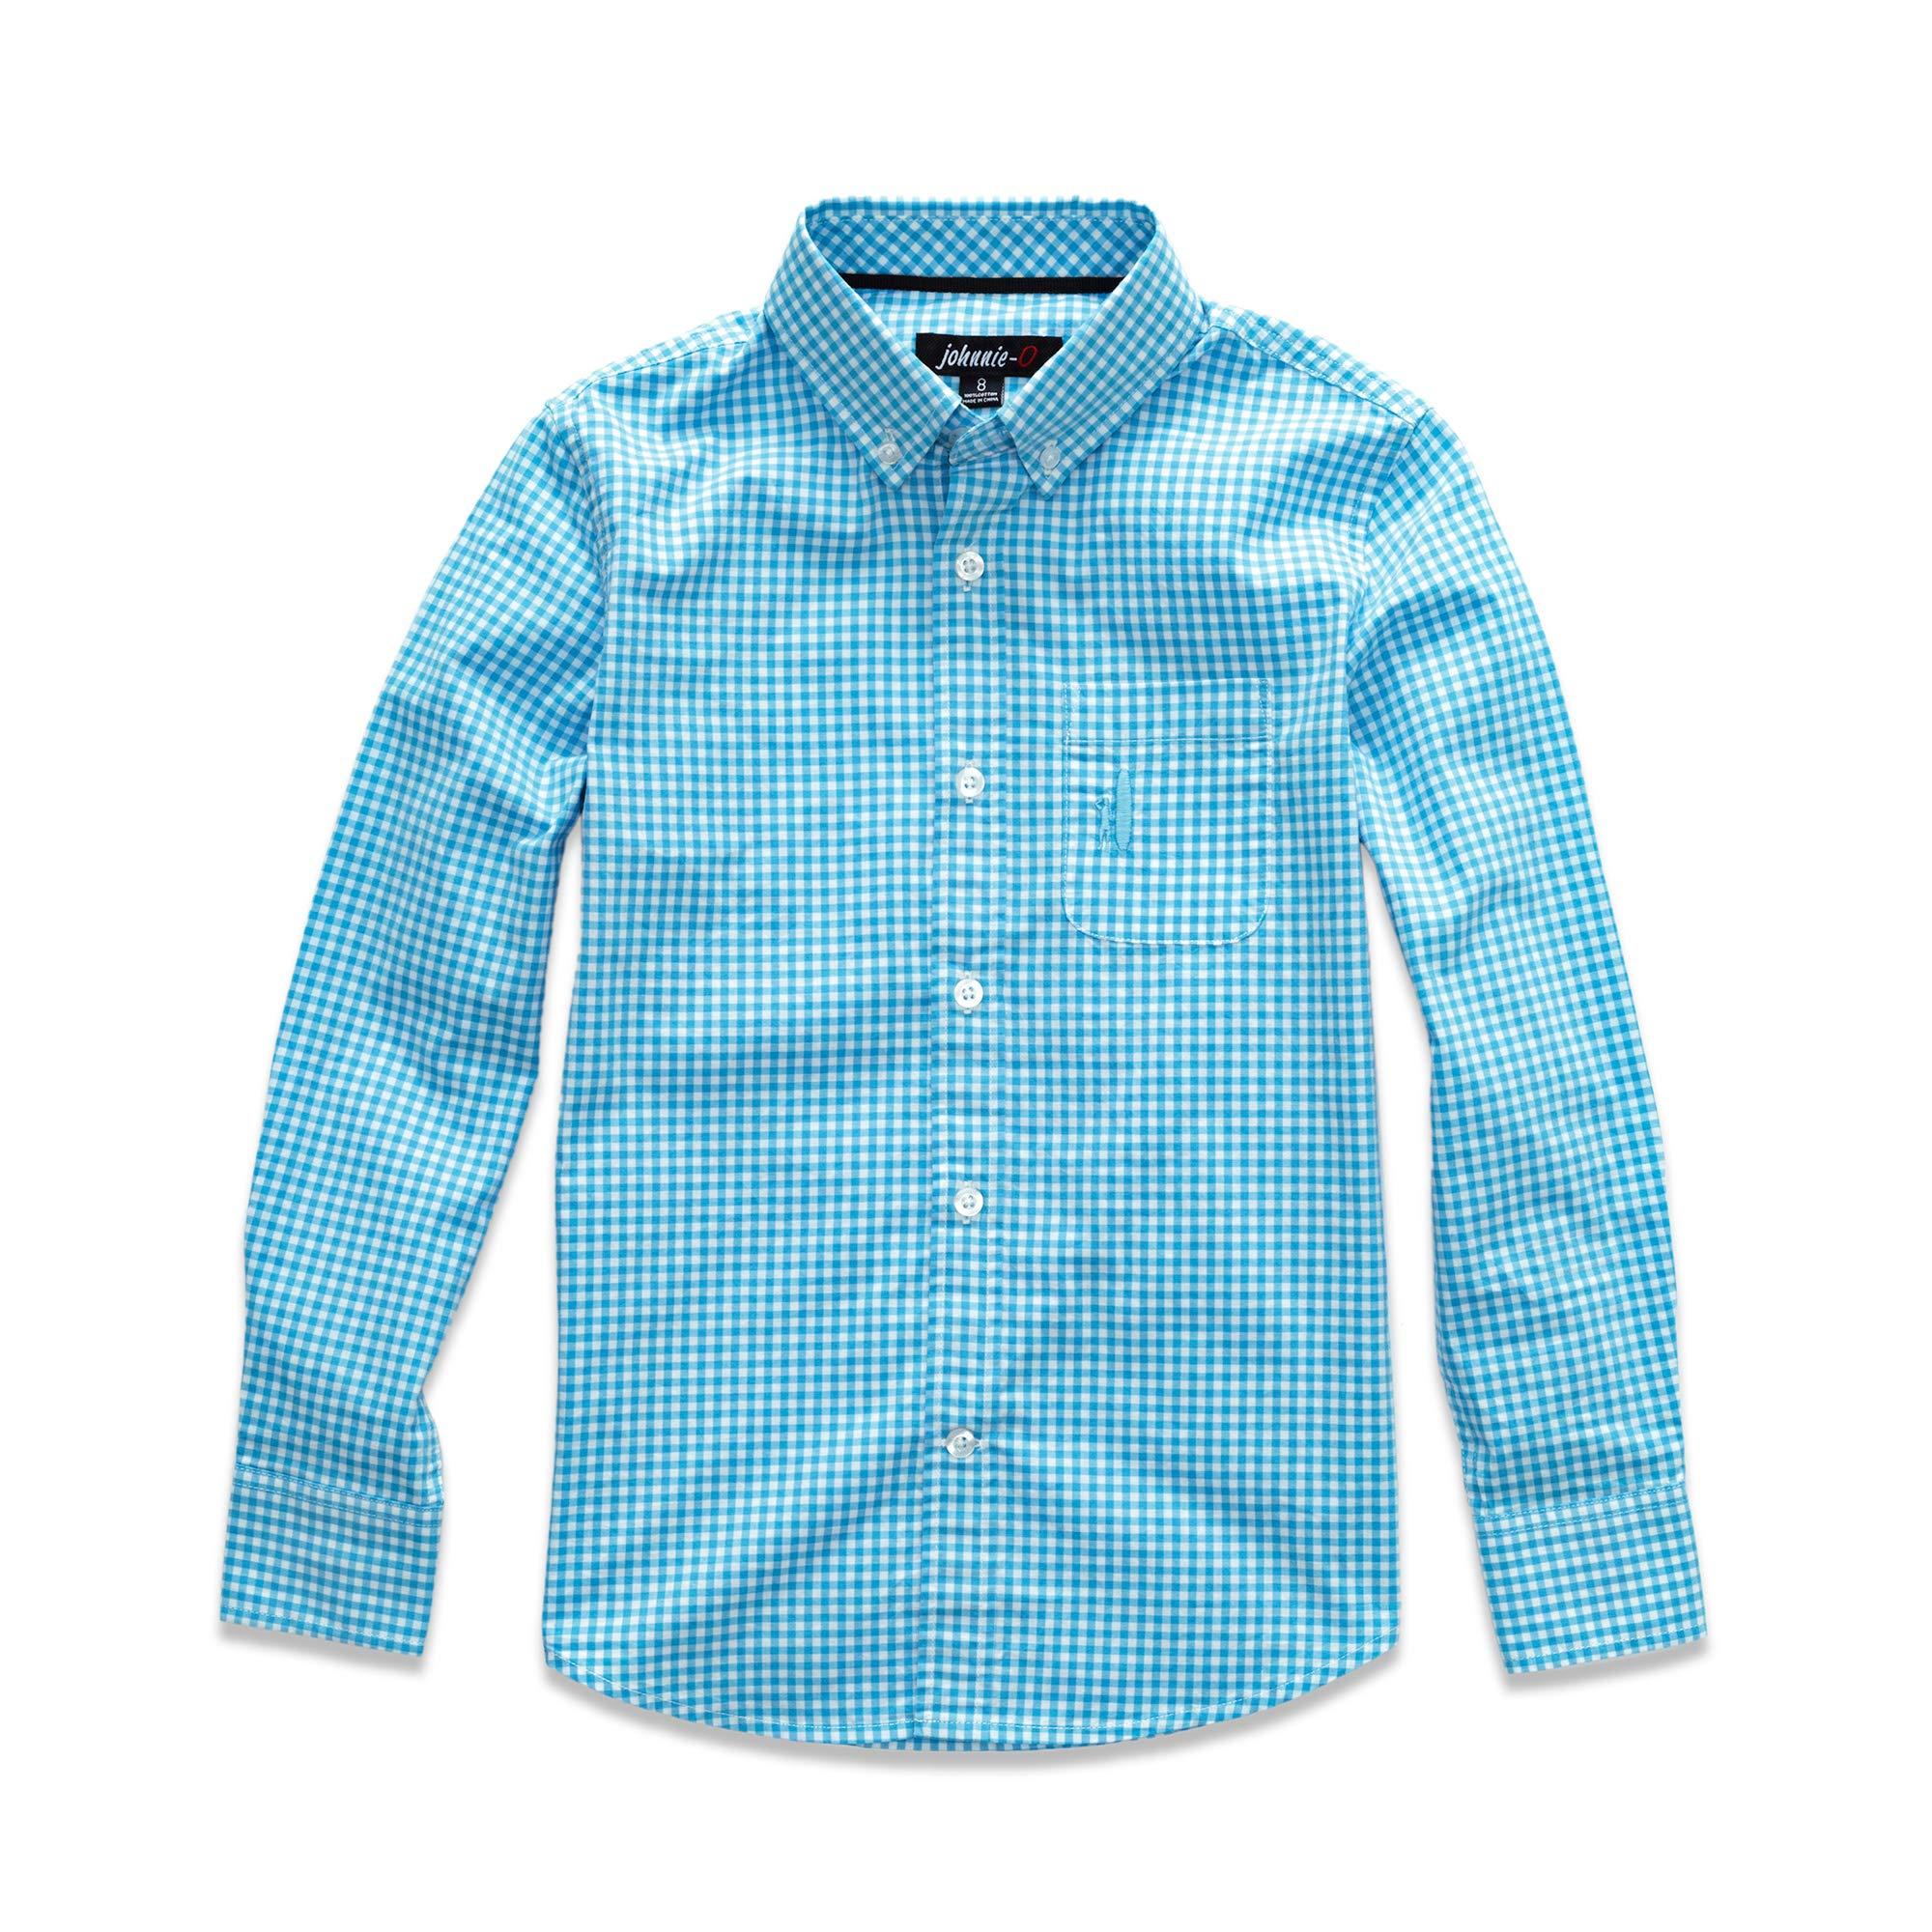 johnnie-O Boy's Berner Button-Down Shirt, Blue Mist, 10